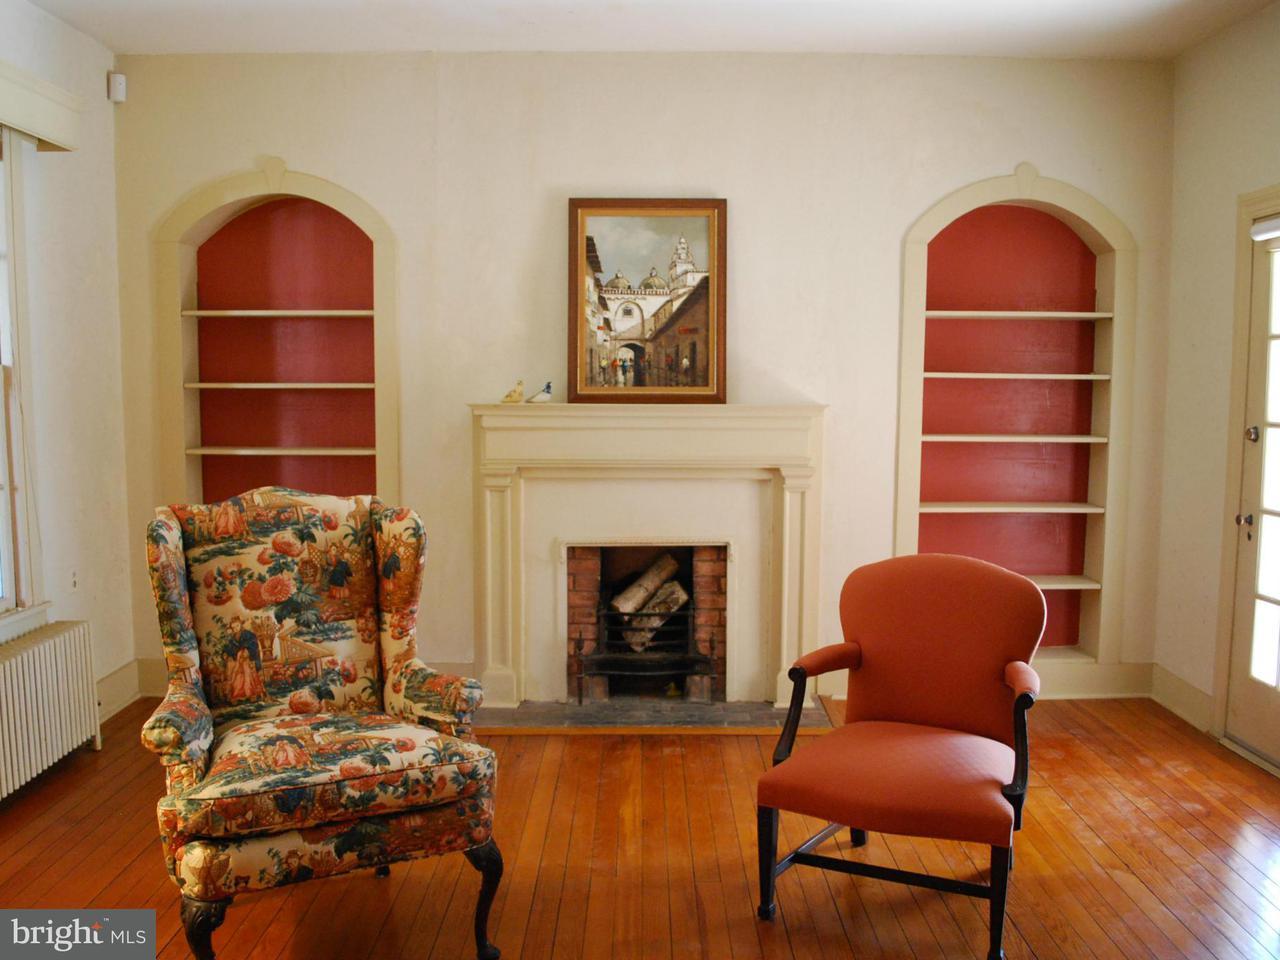 Additional photo for property listing at 210 Morris St S 210 Morris St S Oxford, Maryland 21654 Estados Unidos